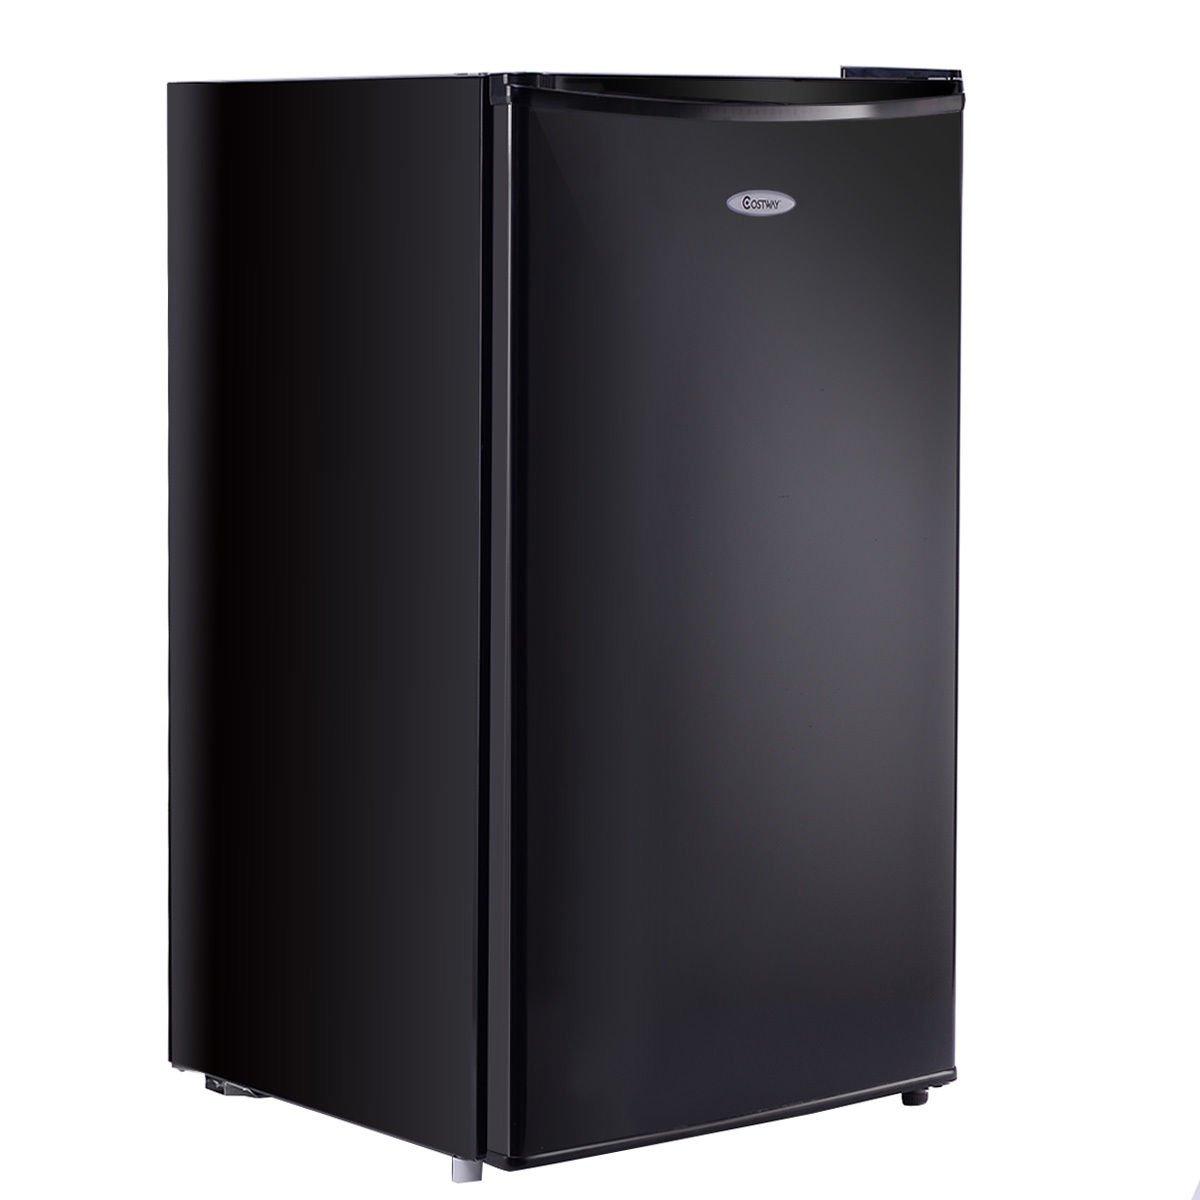 Costway Min Refrigerator Small Freezer Cooler Fridge,3.2 Cu Ft Unit, Stainless Steel,Black